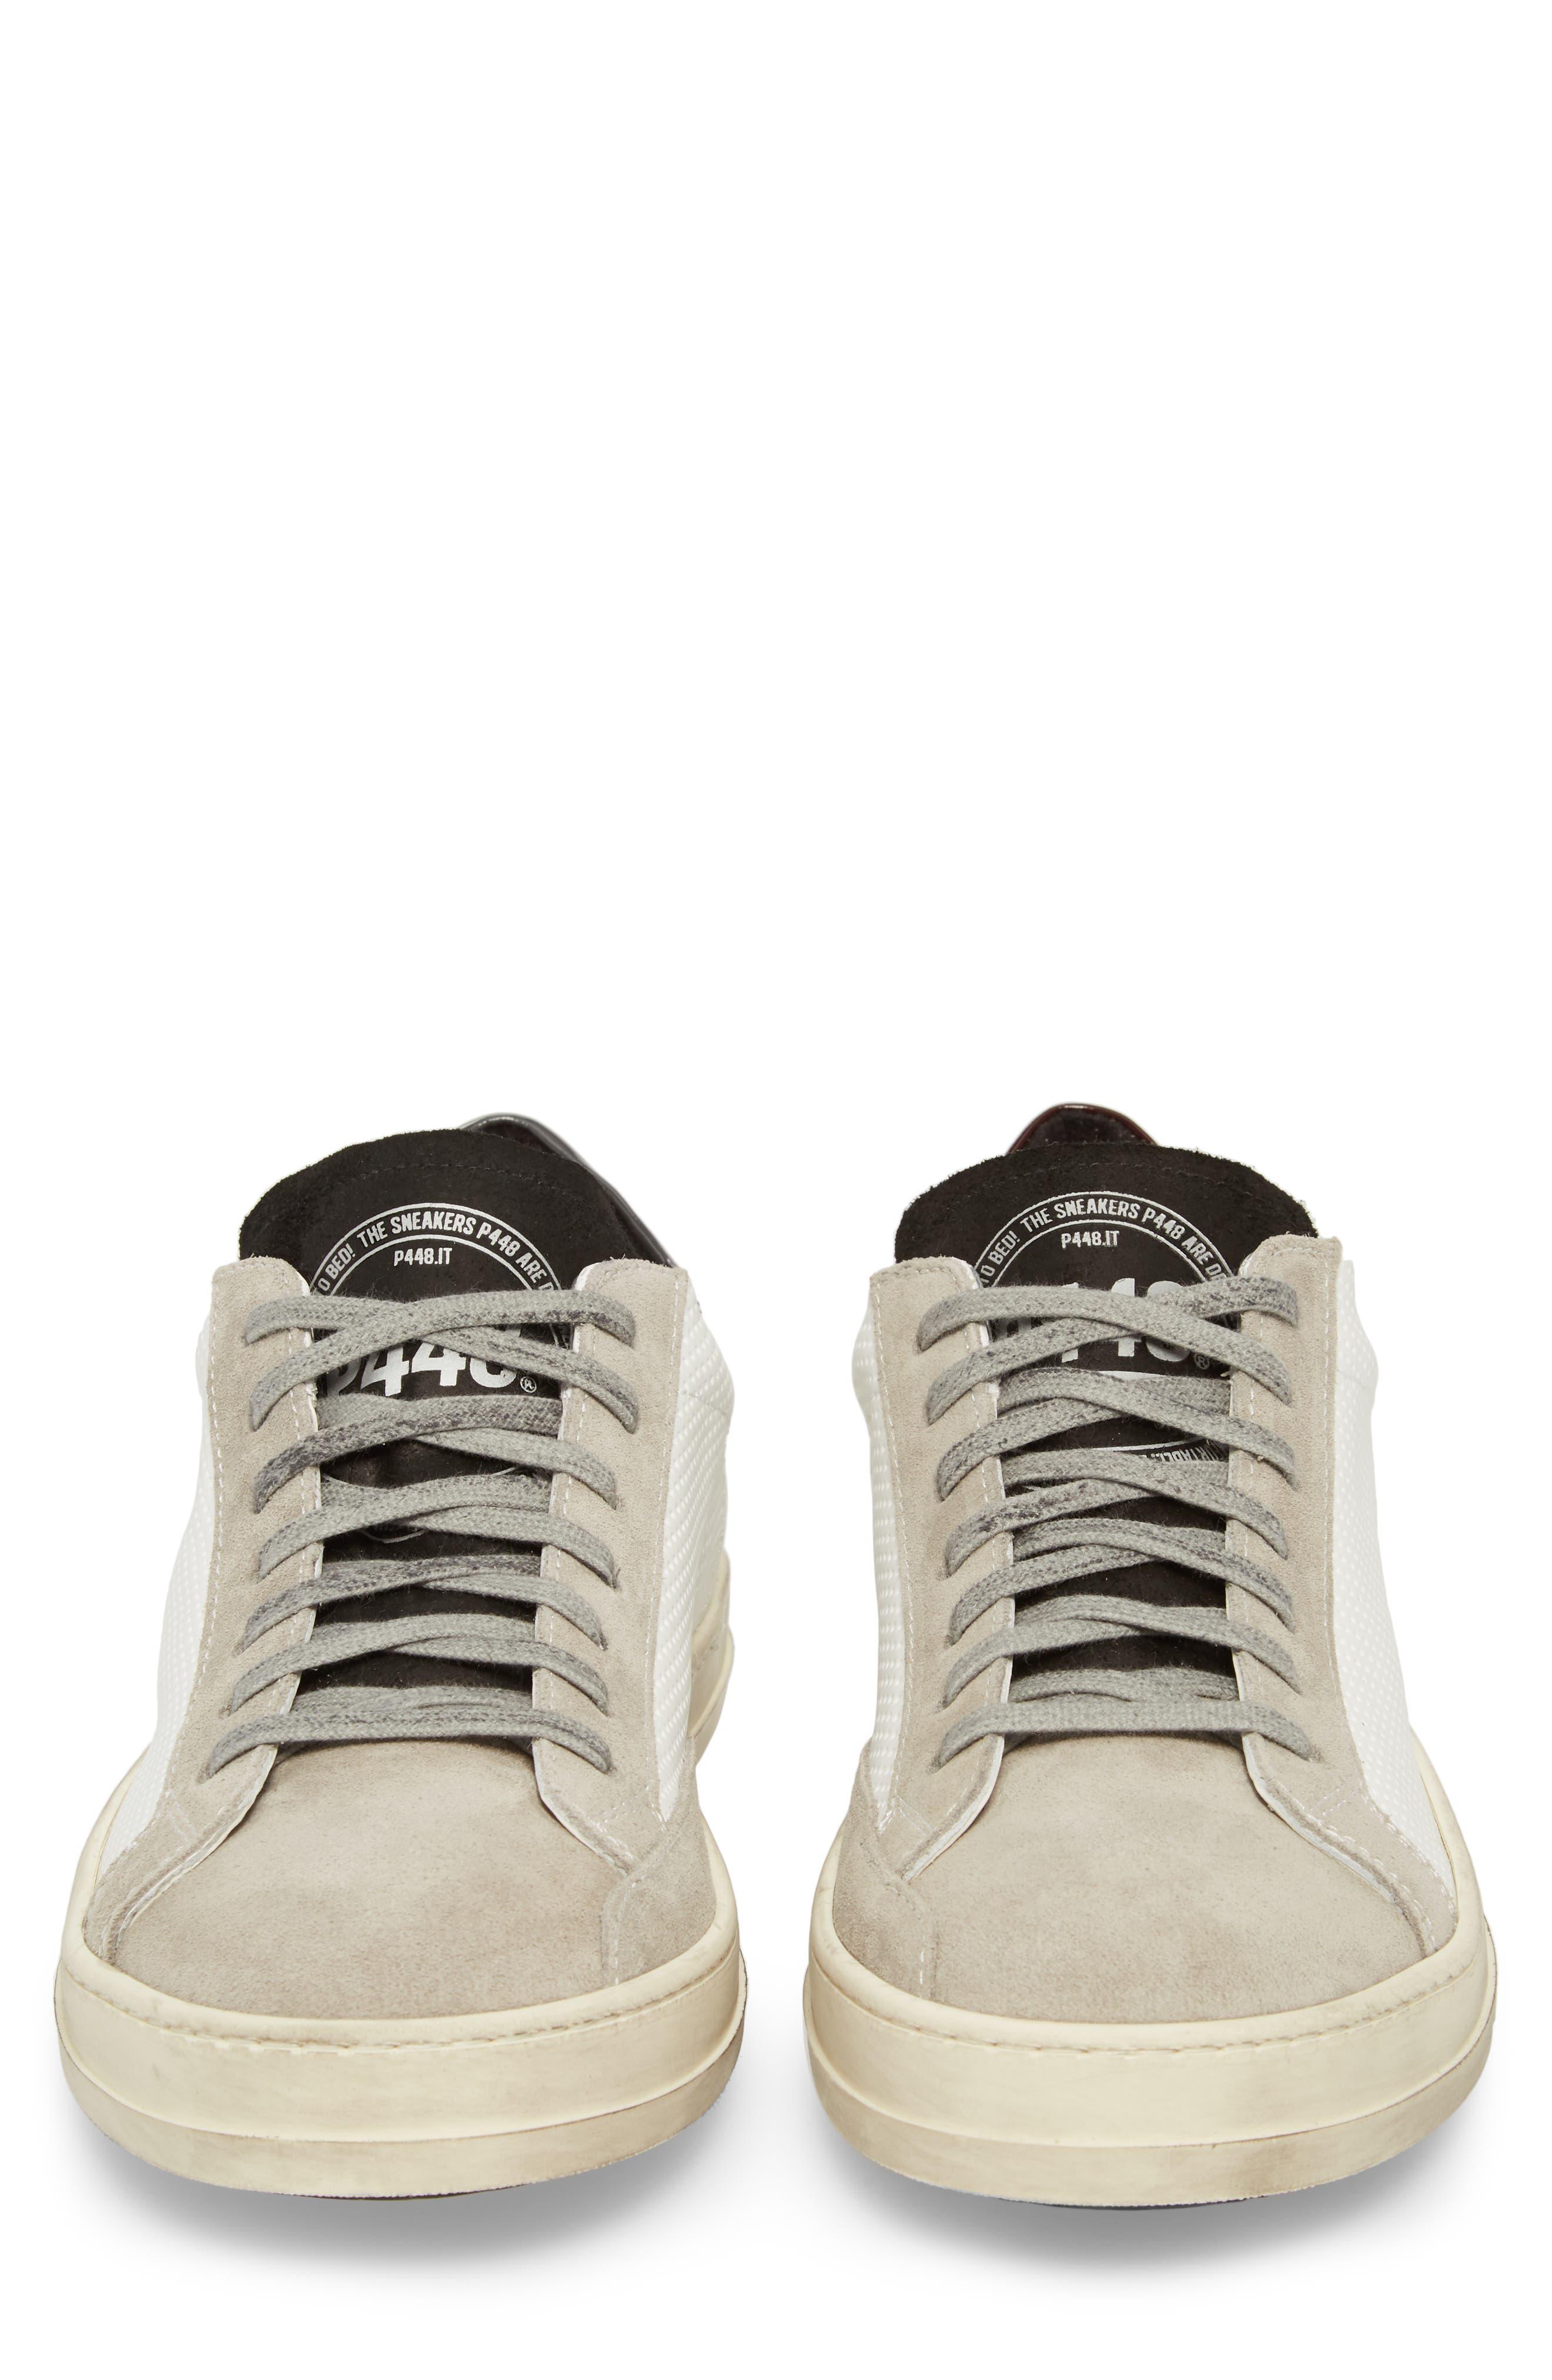 John Mix Low Top Sneaker,                             Alternate thumbnail 5, color,                             100